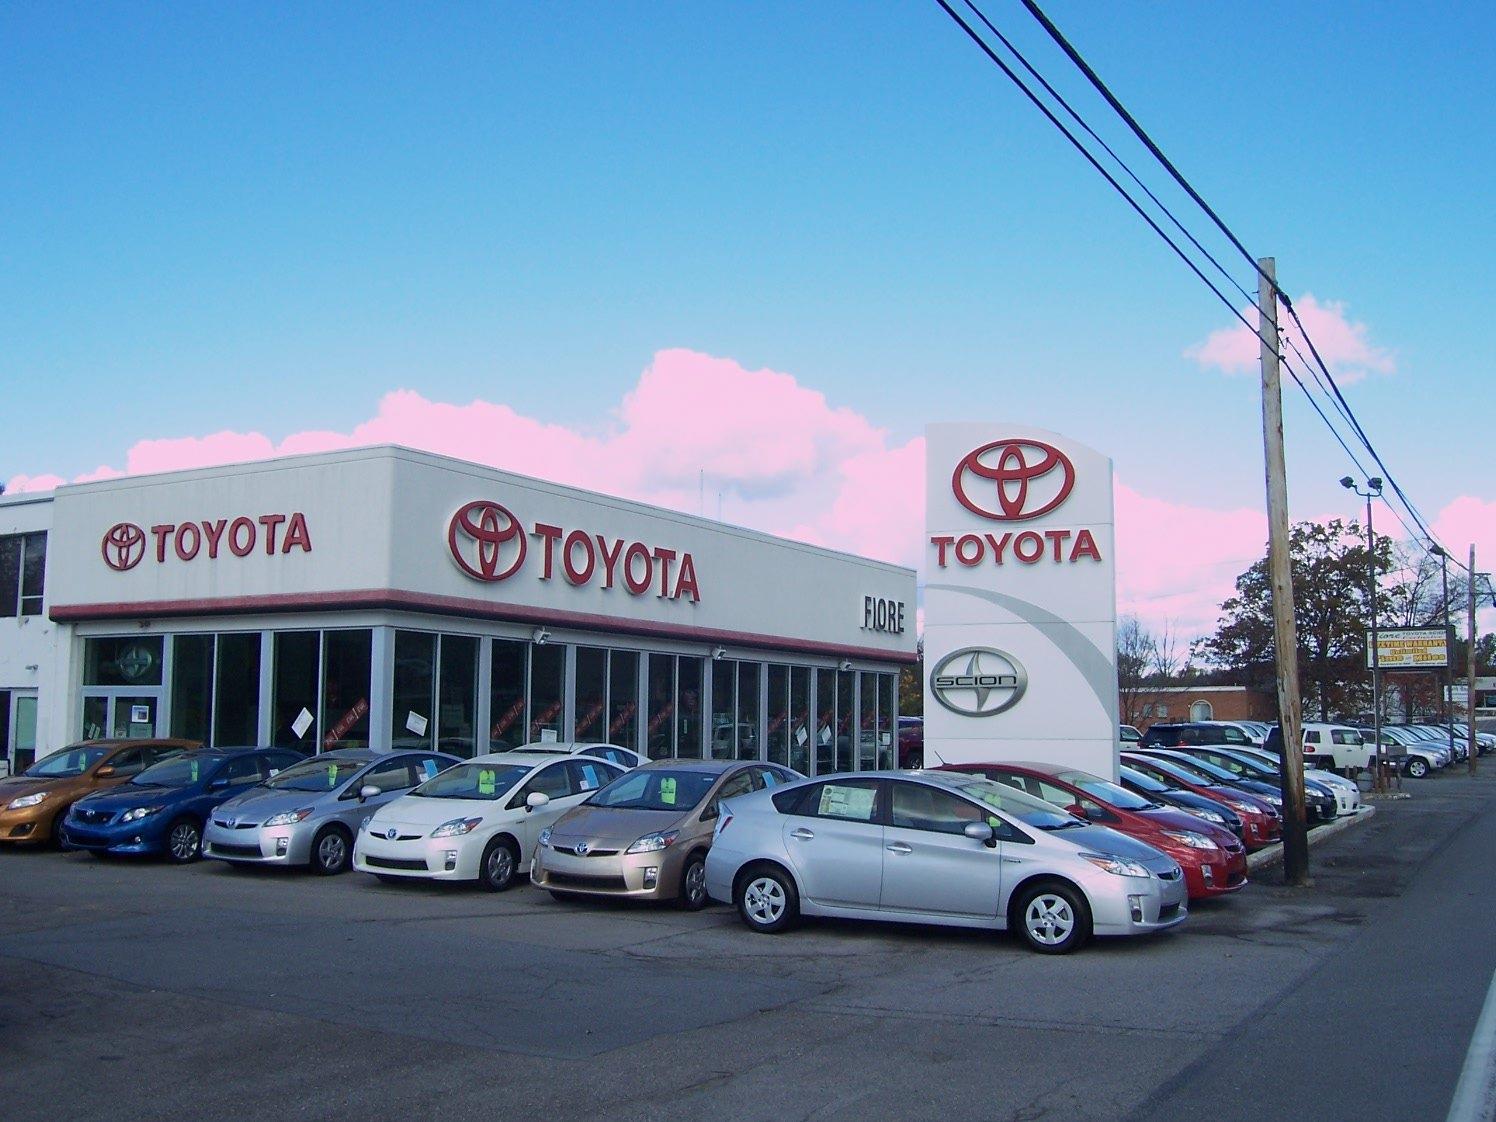 Fiore Toyota image 4